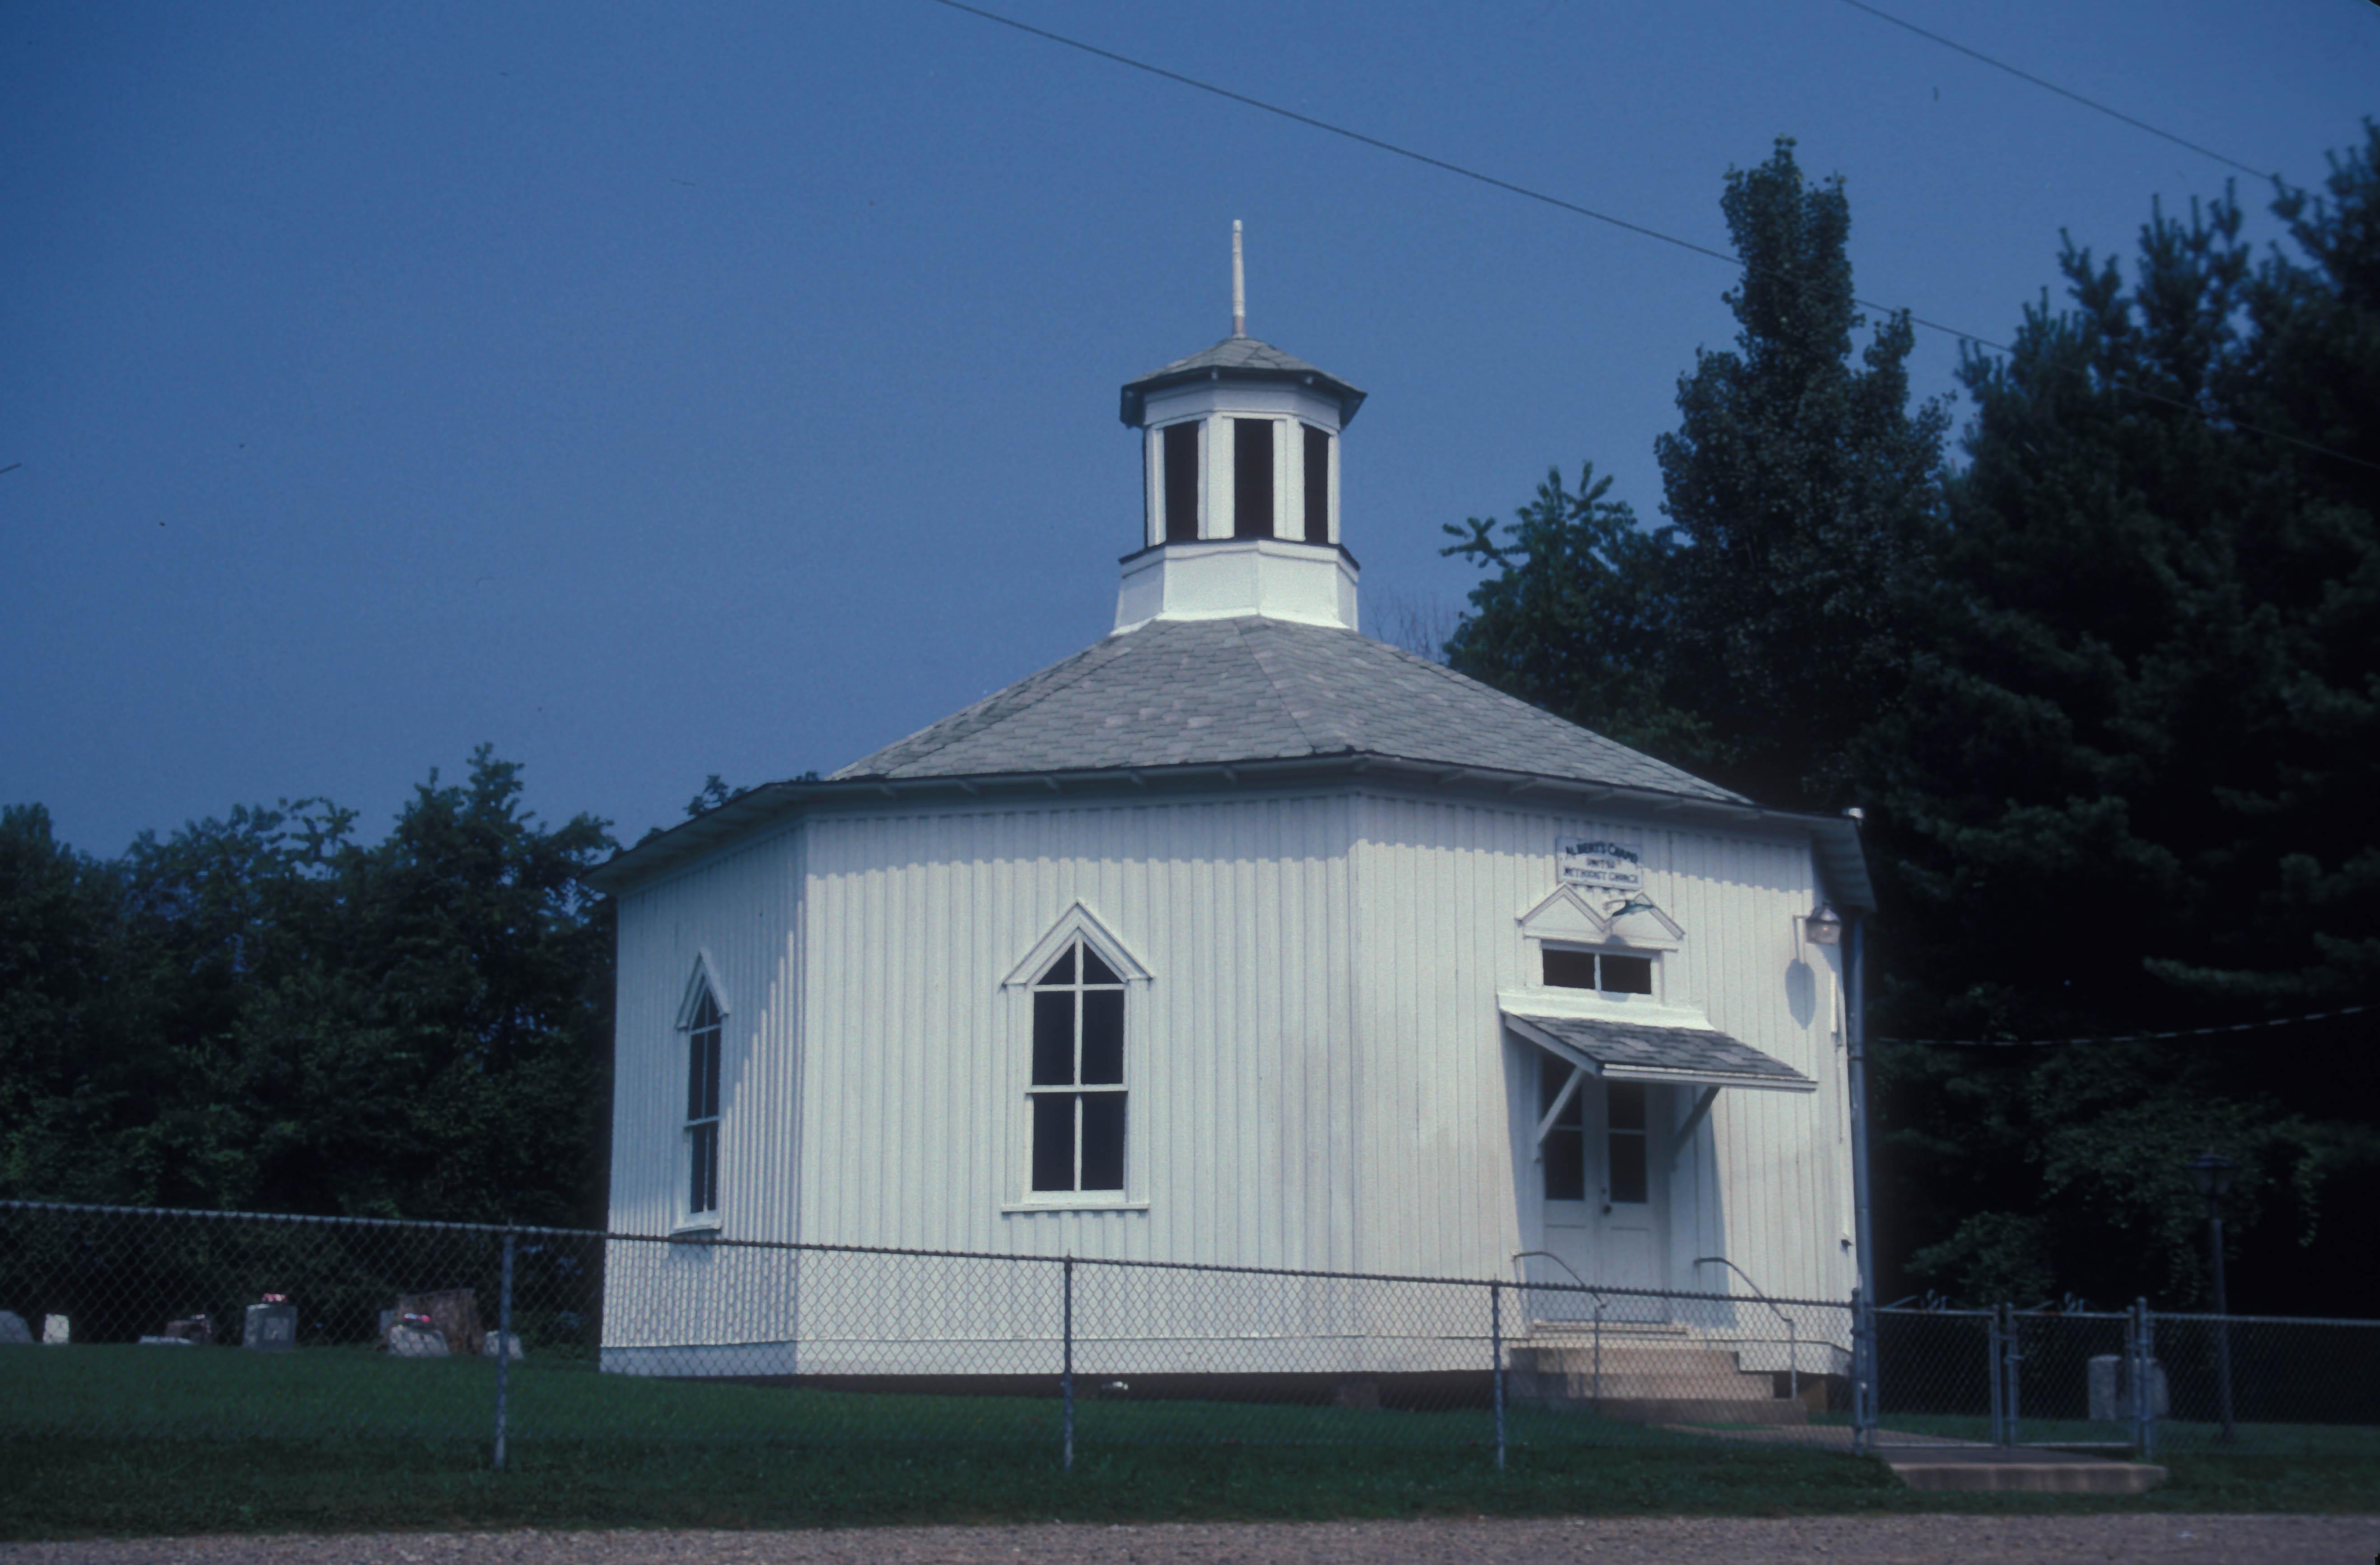 Alberts Chapel Spencer Roadtrippers